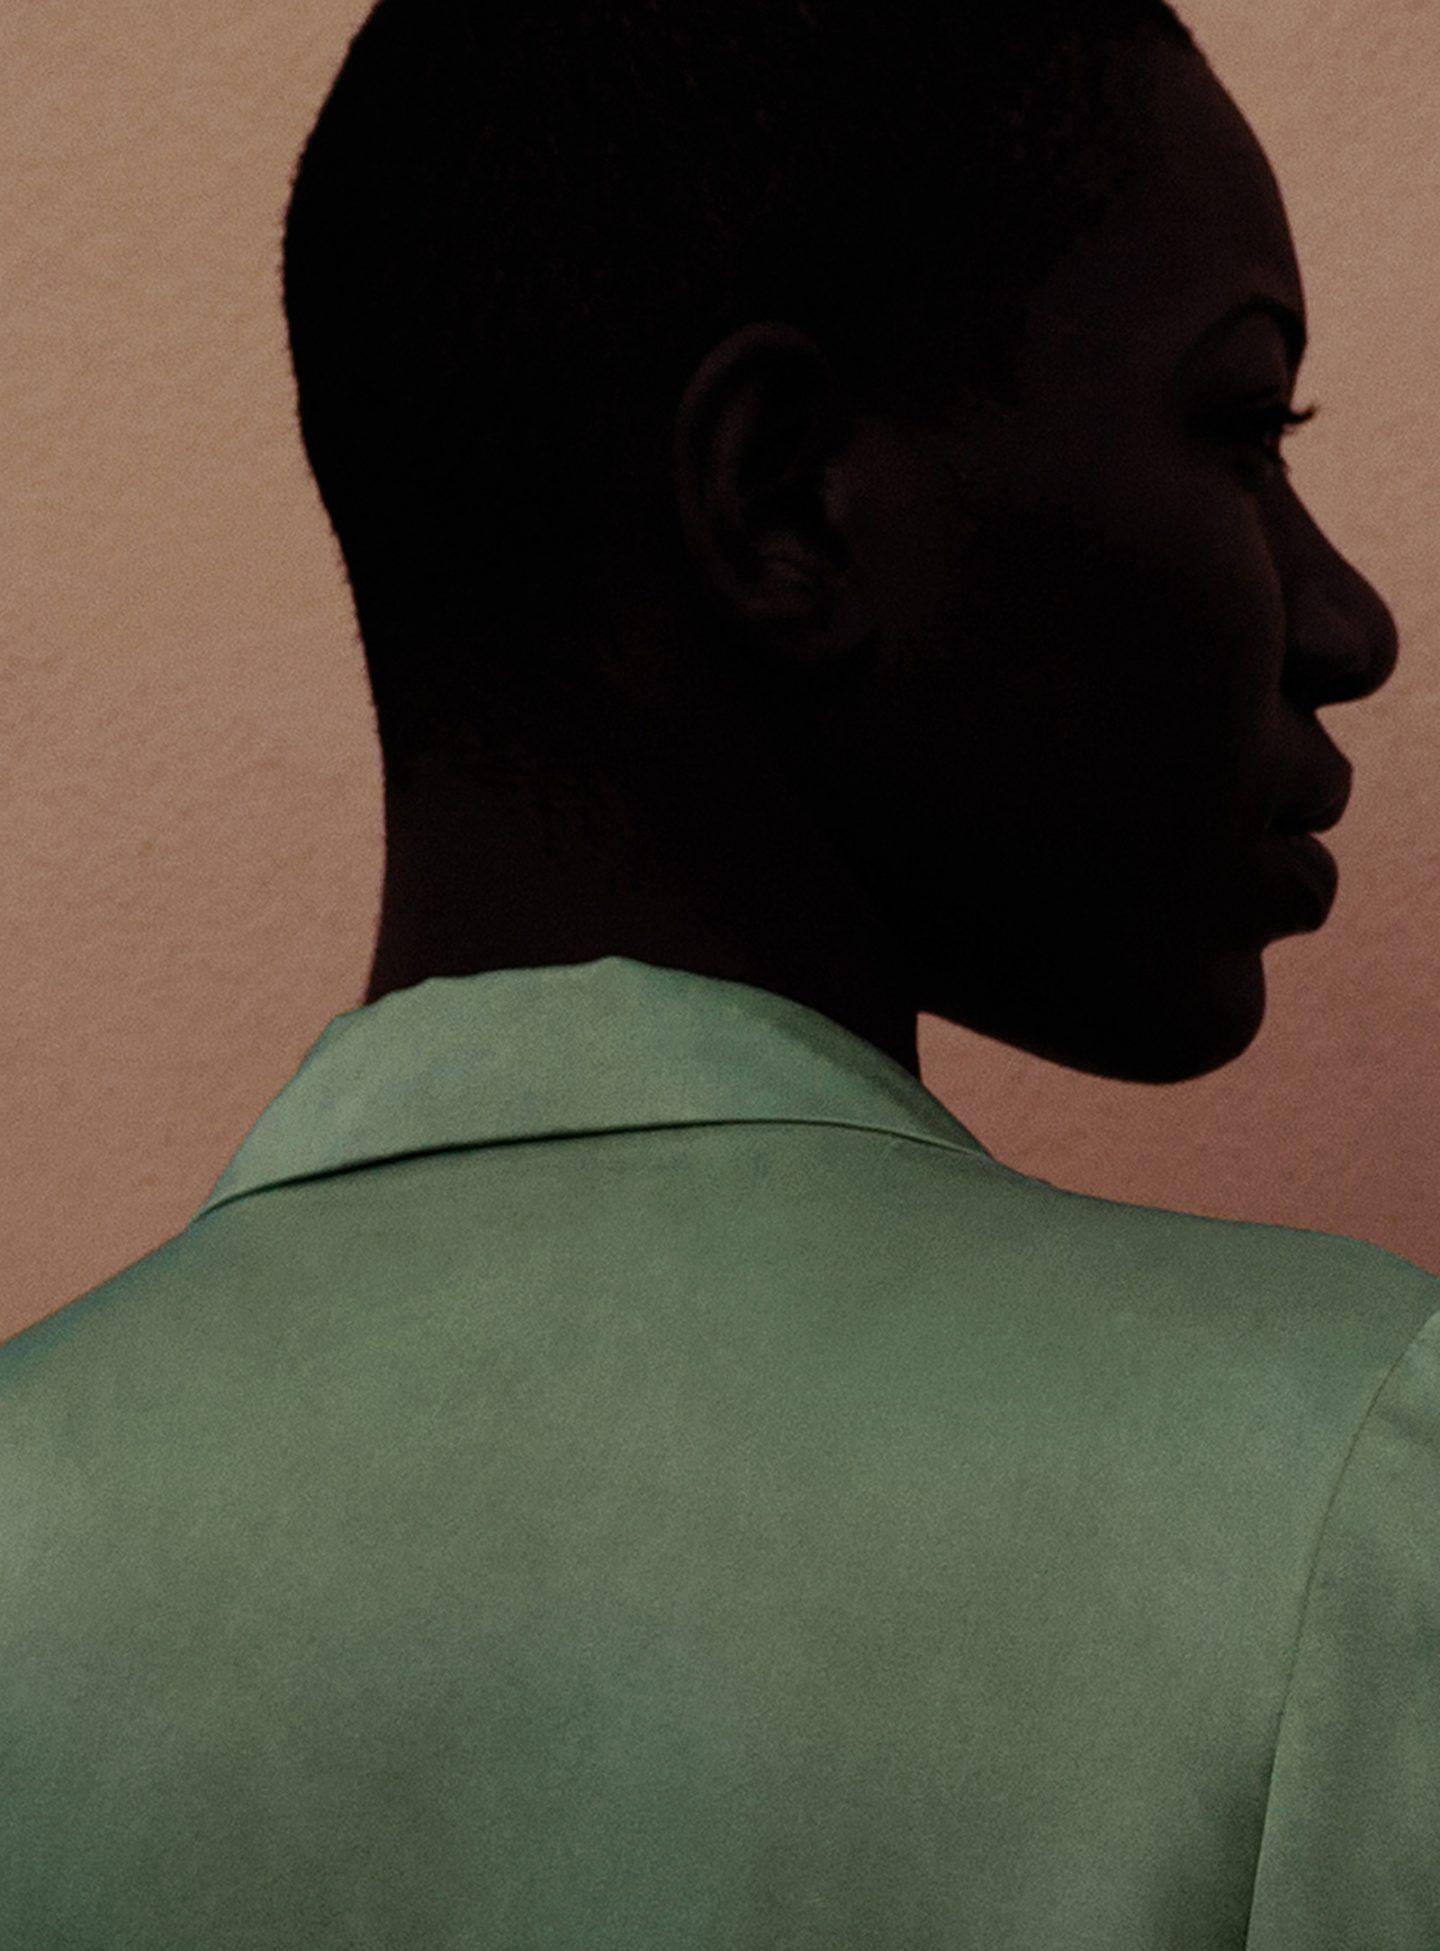 IGNANT-Photography-Sonia-Szostak-09